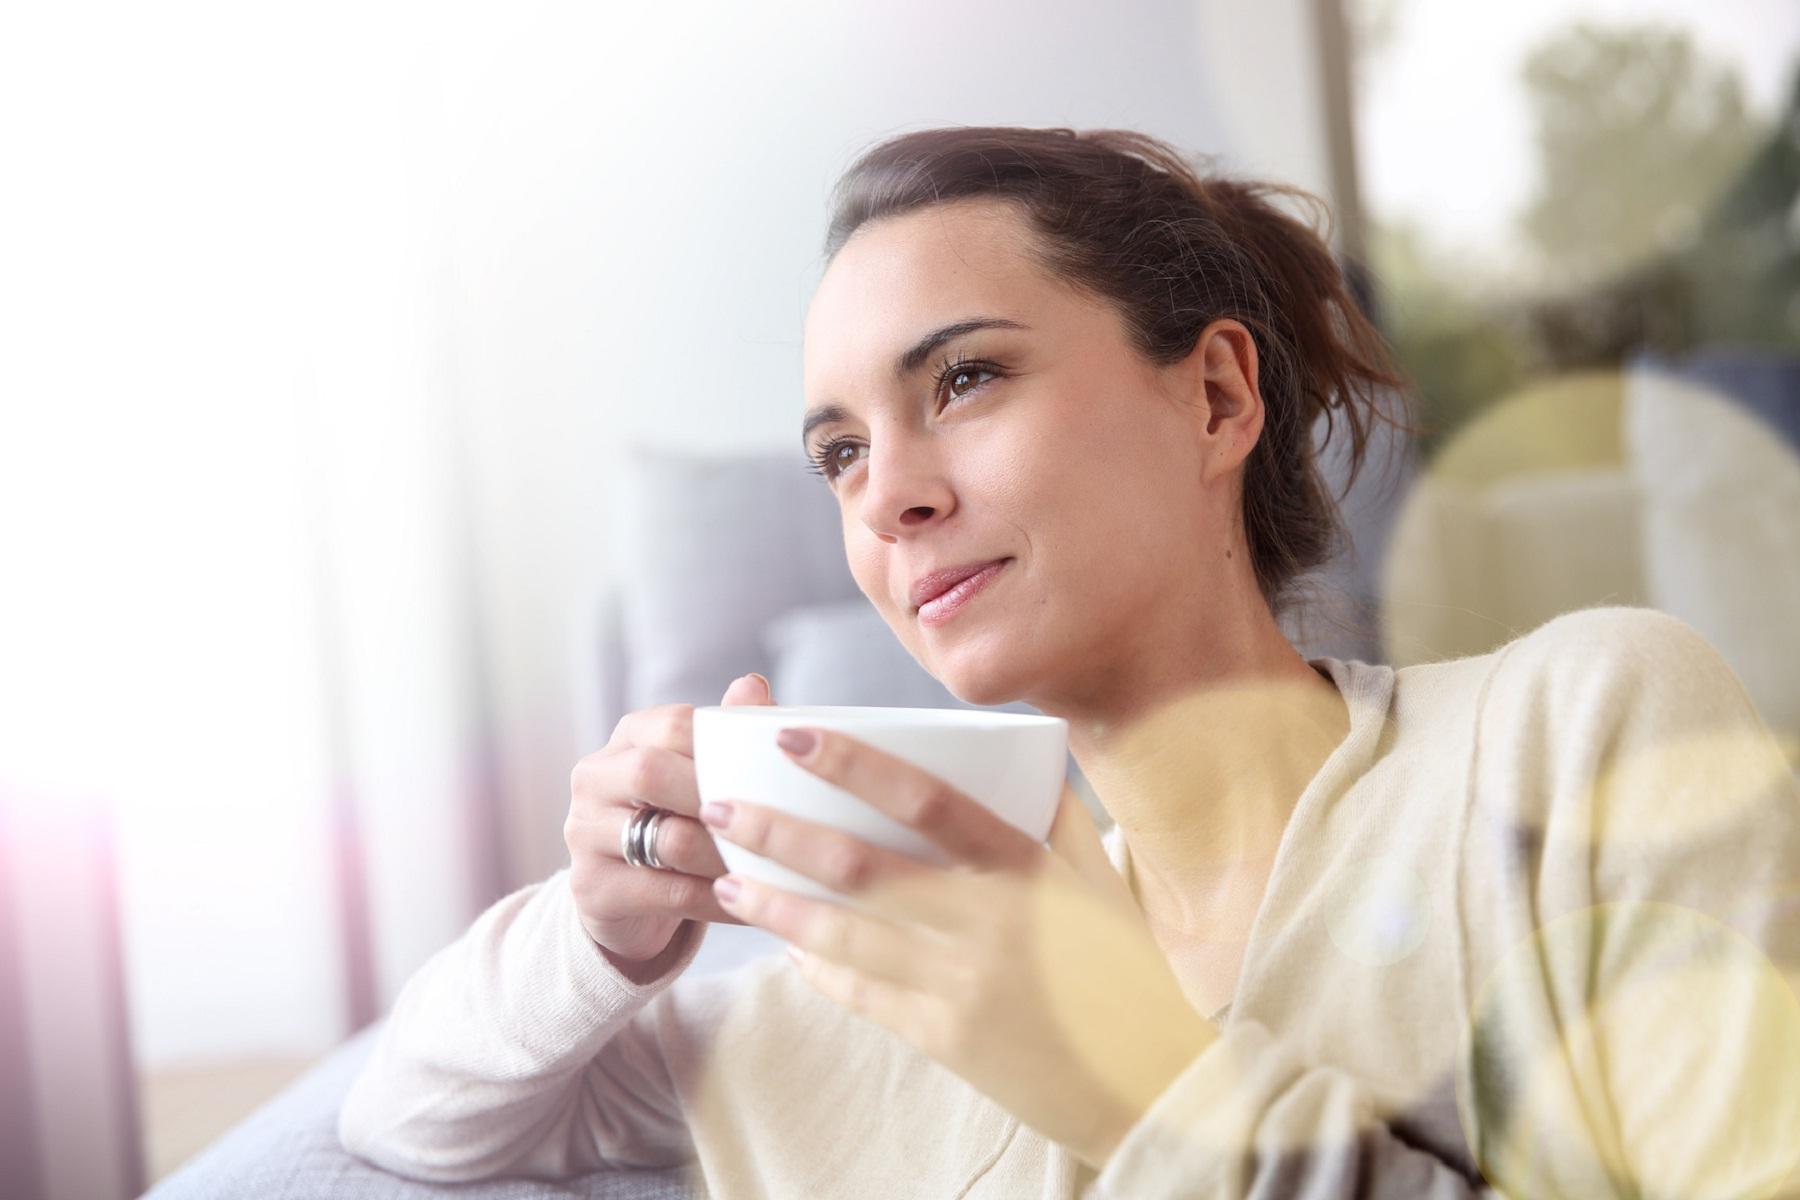 chaj-kafe-hidratirat4